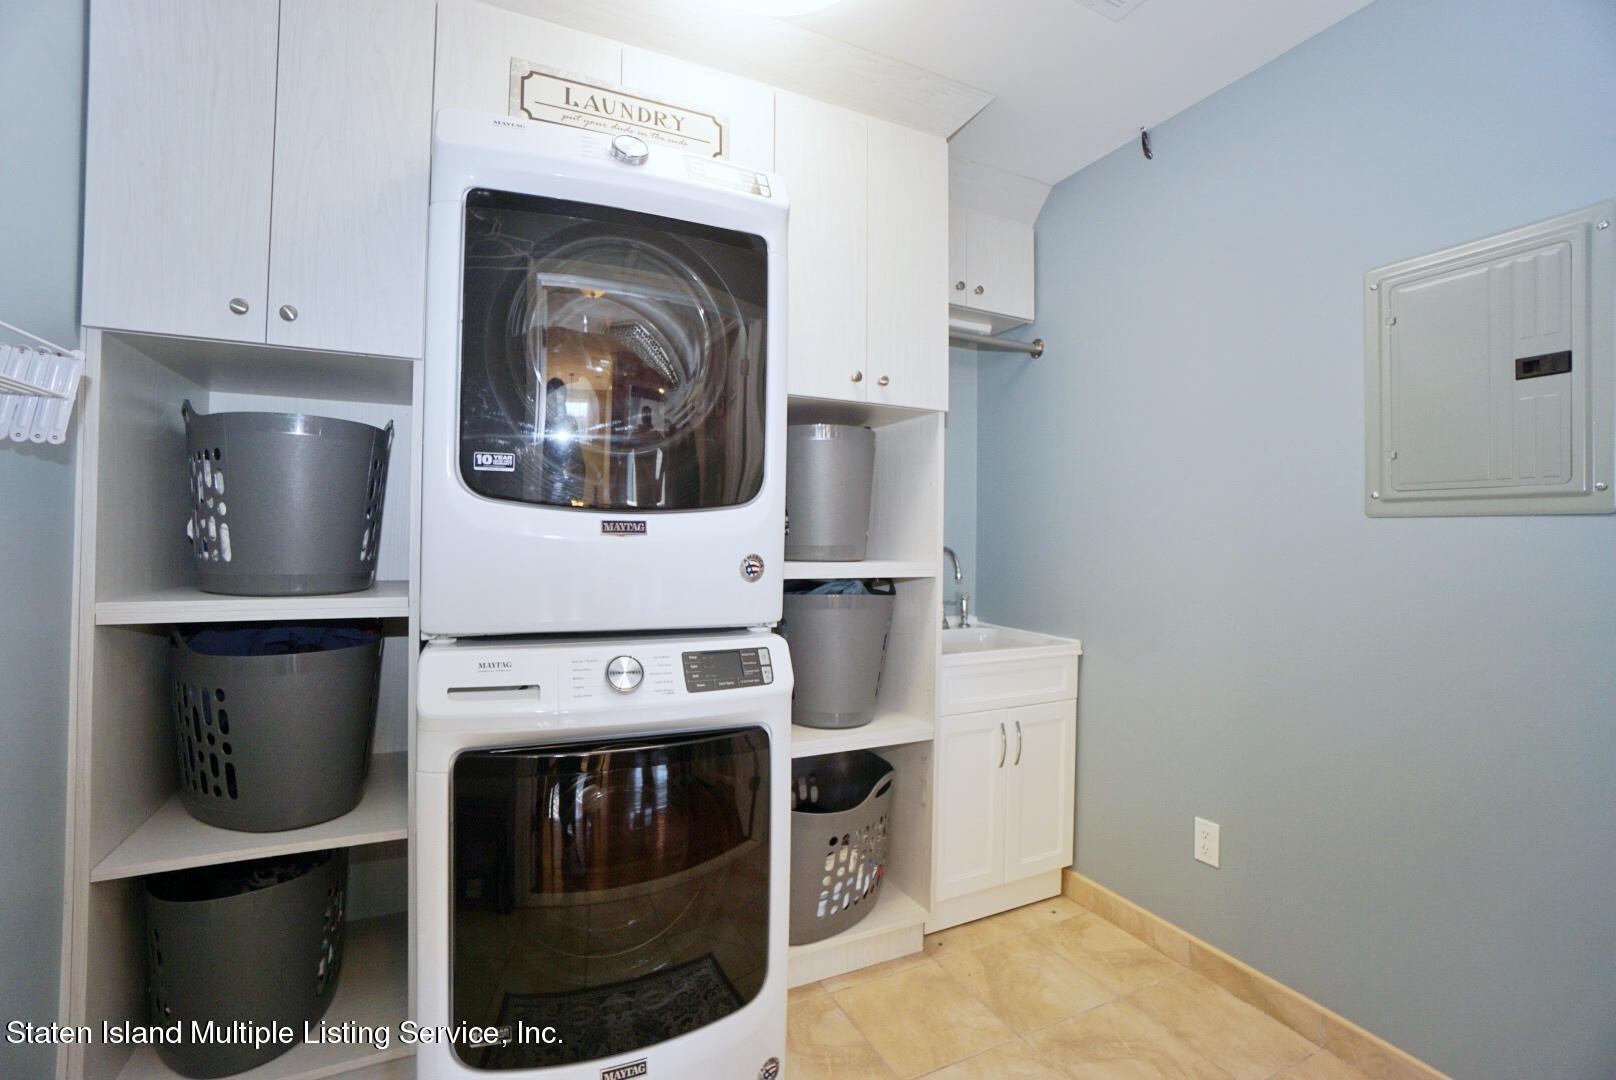 Single Family - Detached 31 Belwood Loop  Staten Island, NY 10307, MLS-1143133-41